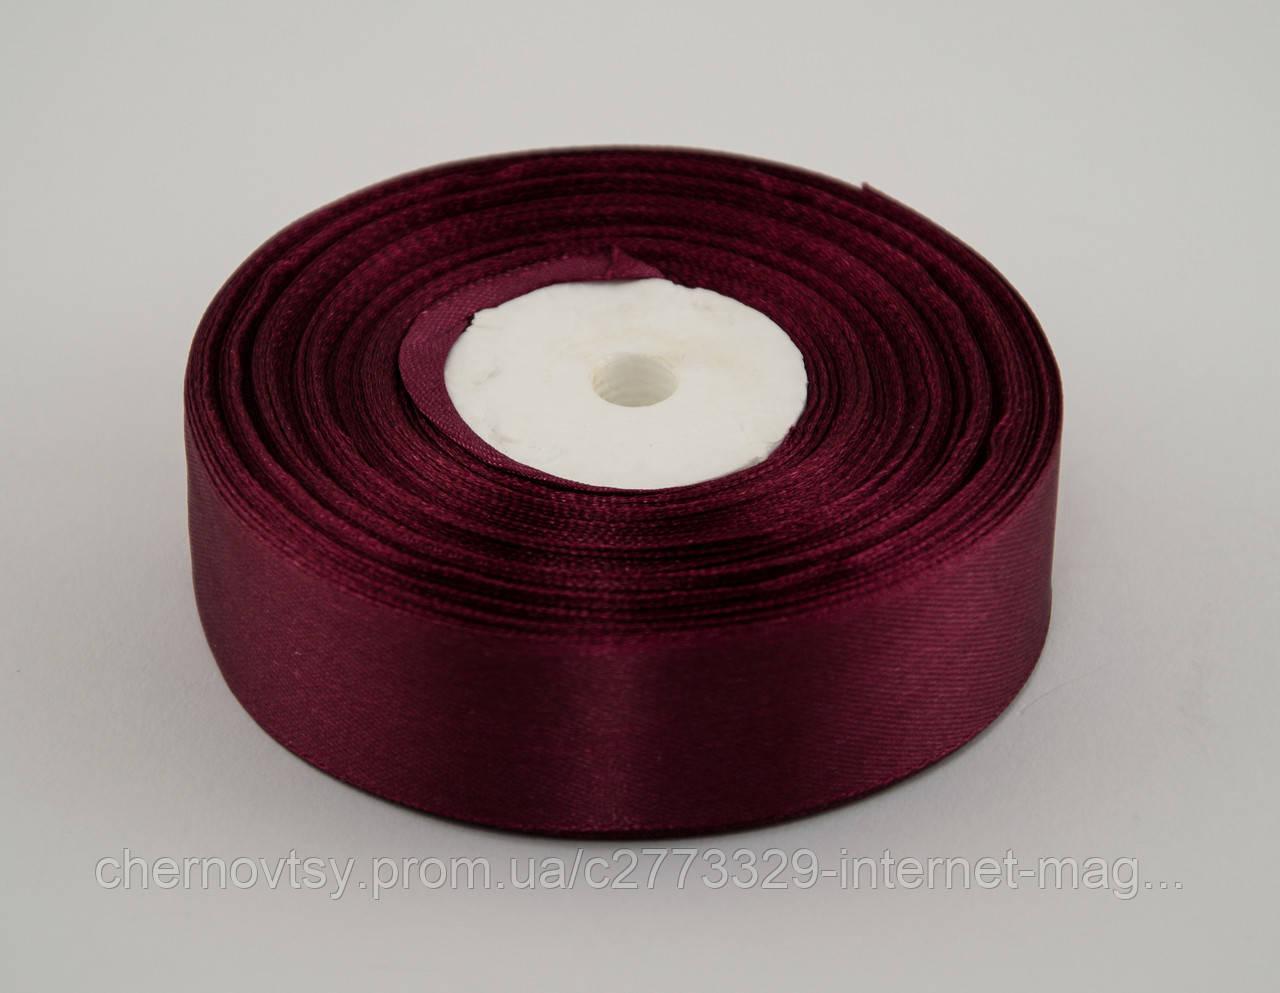 Лента атлас 0.9 см, 33 м, № 83 Темно-бордовая